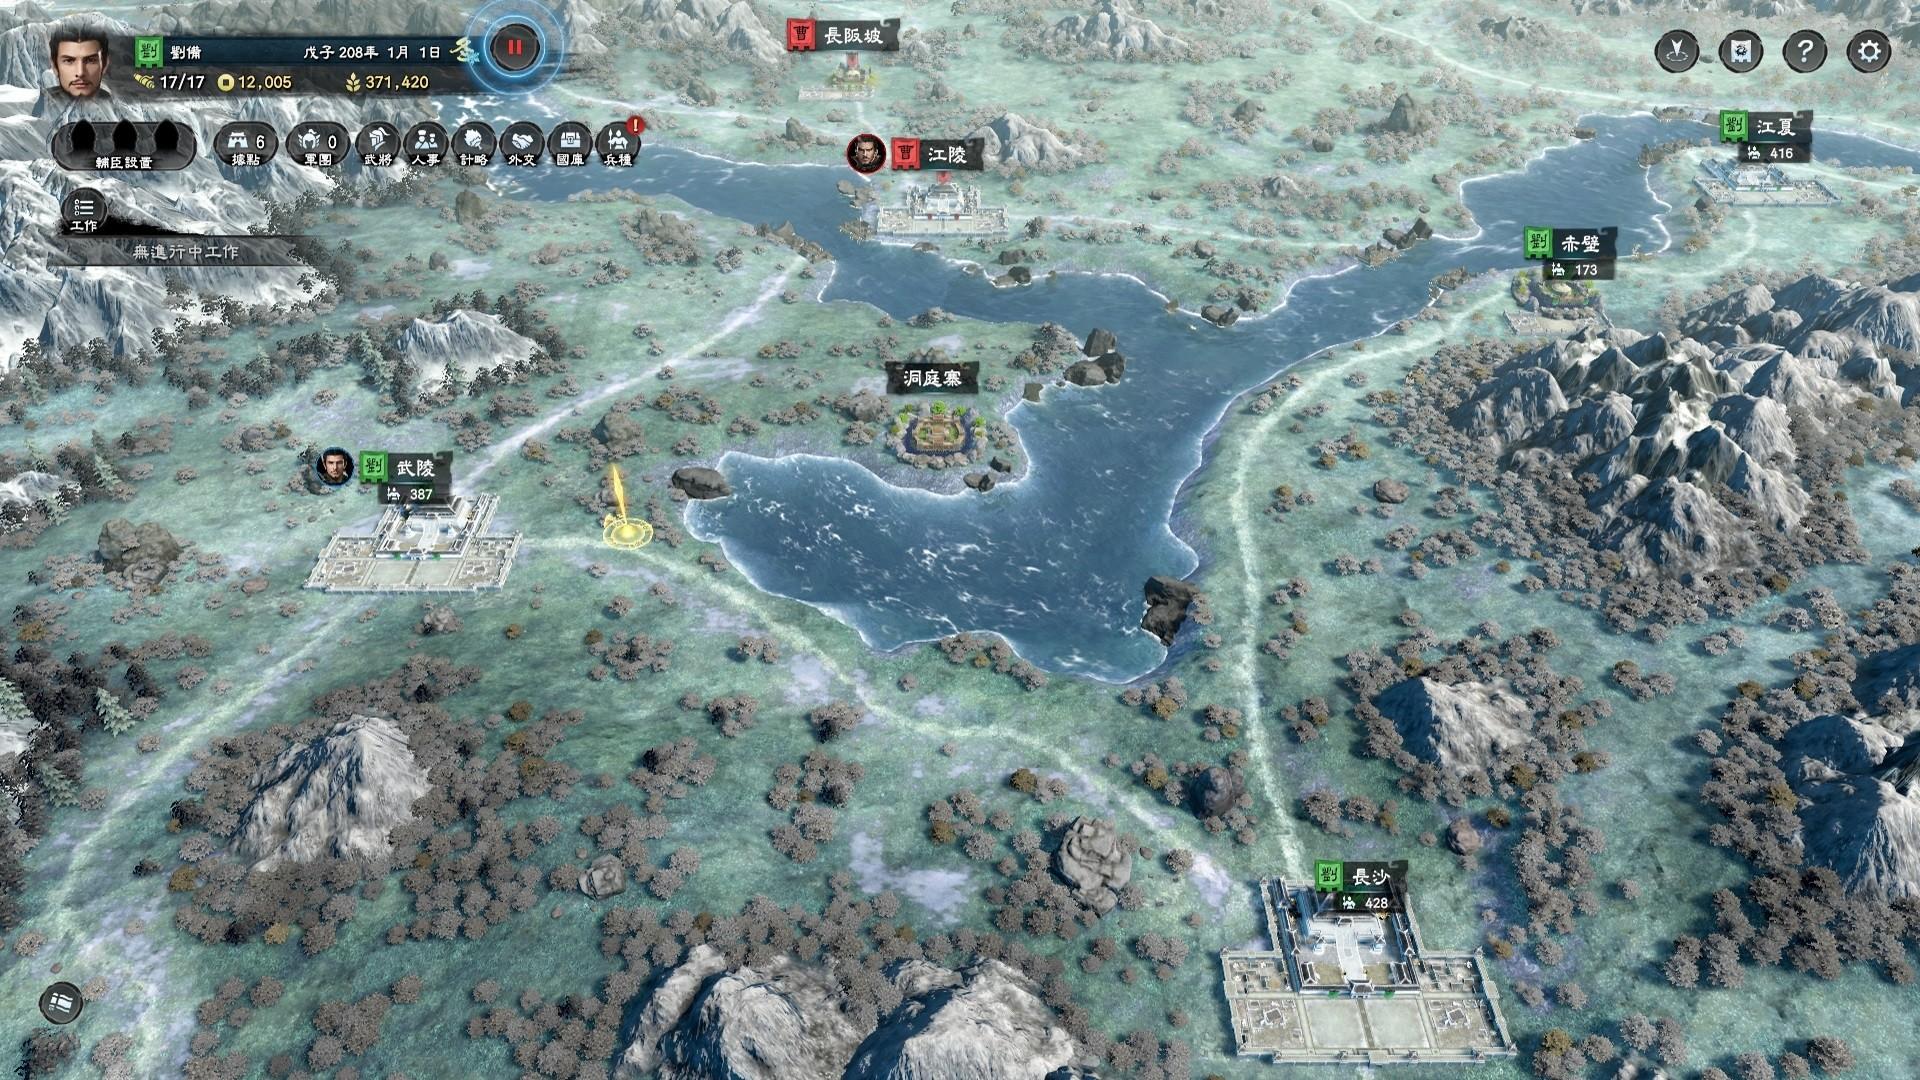 Heroes of the Three Kingdoms 8 screenshot